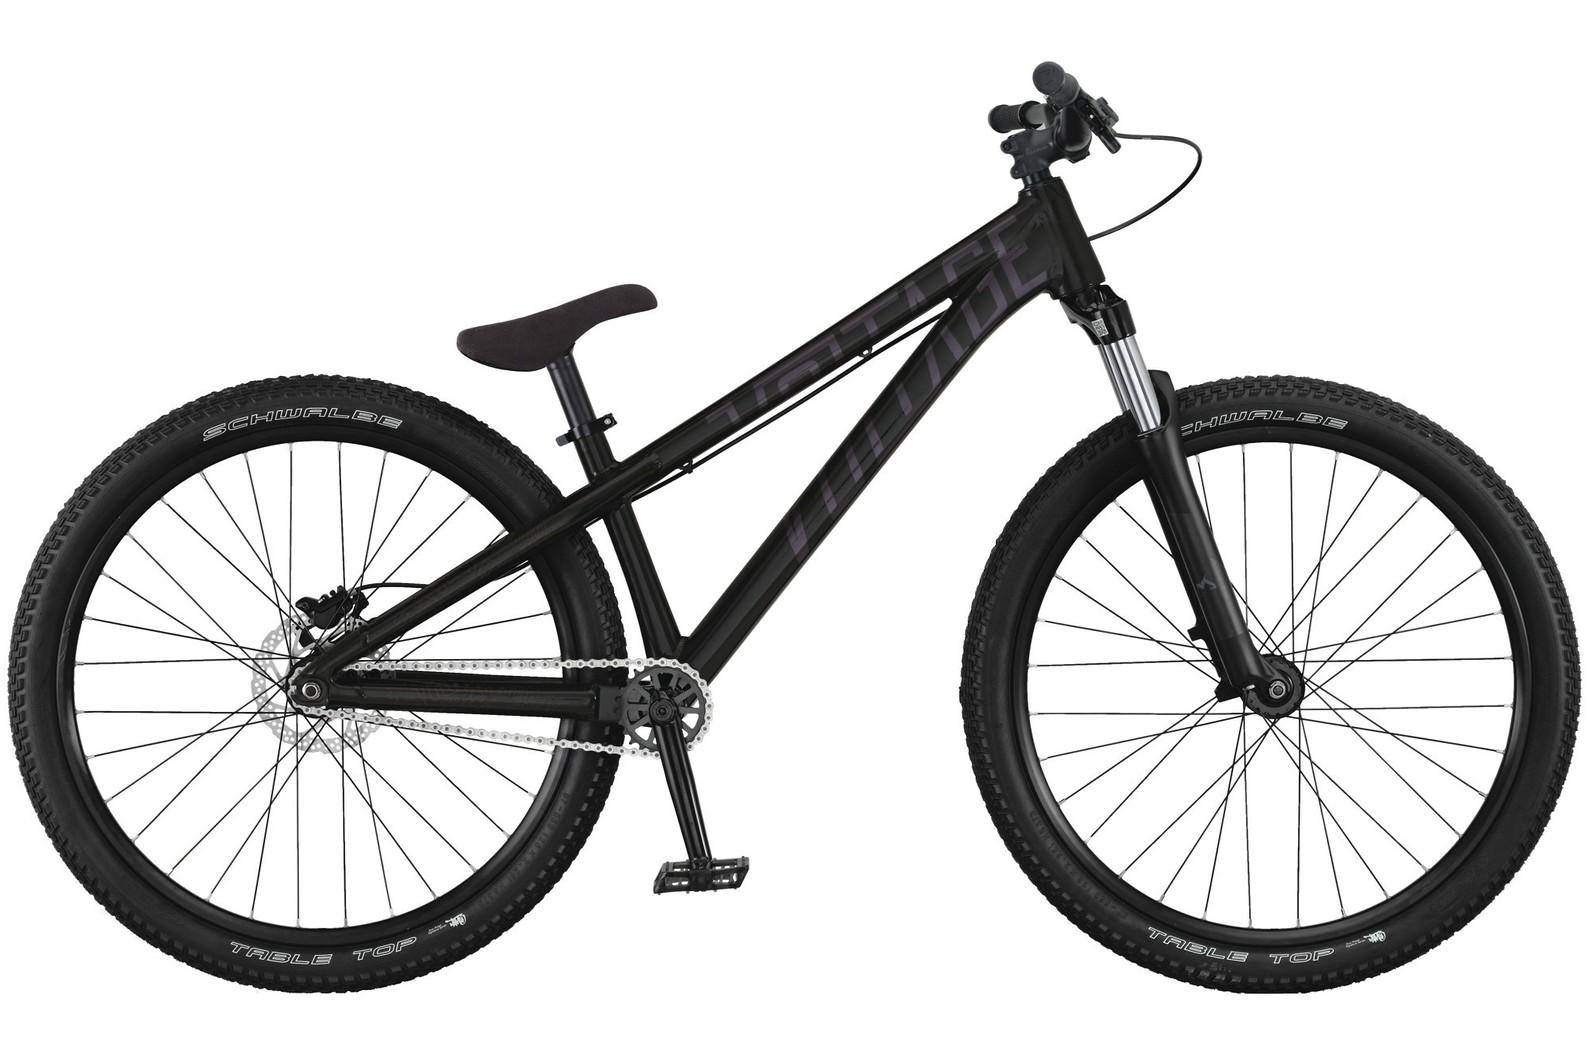 2014 Scott Voltage YZ 0.1 Bike SCOTT Voltage YZ 0.1 Bike